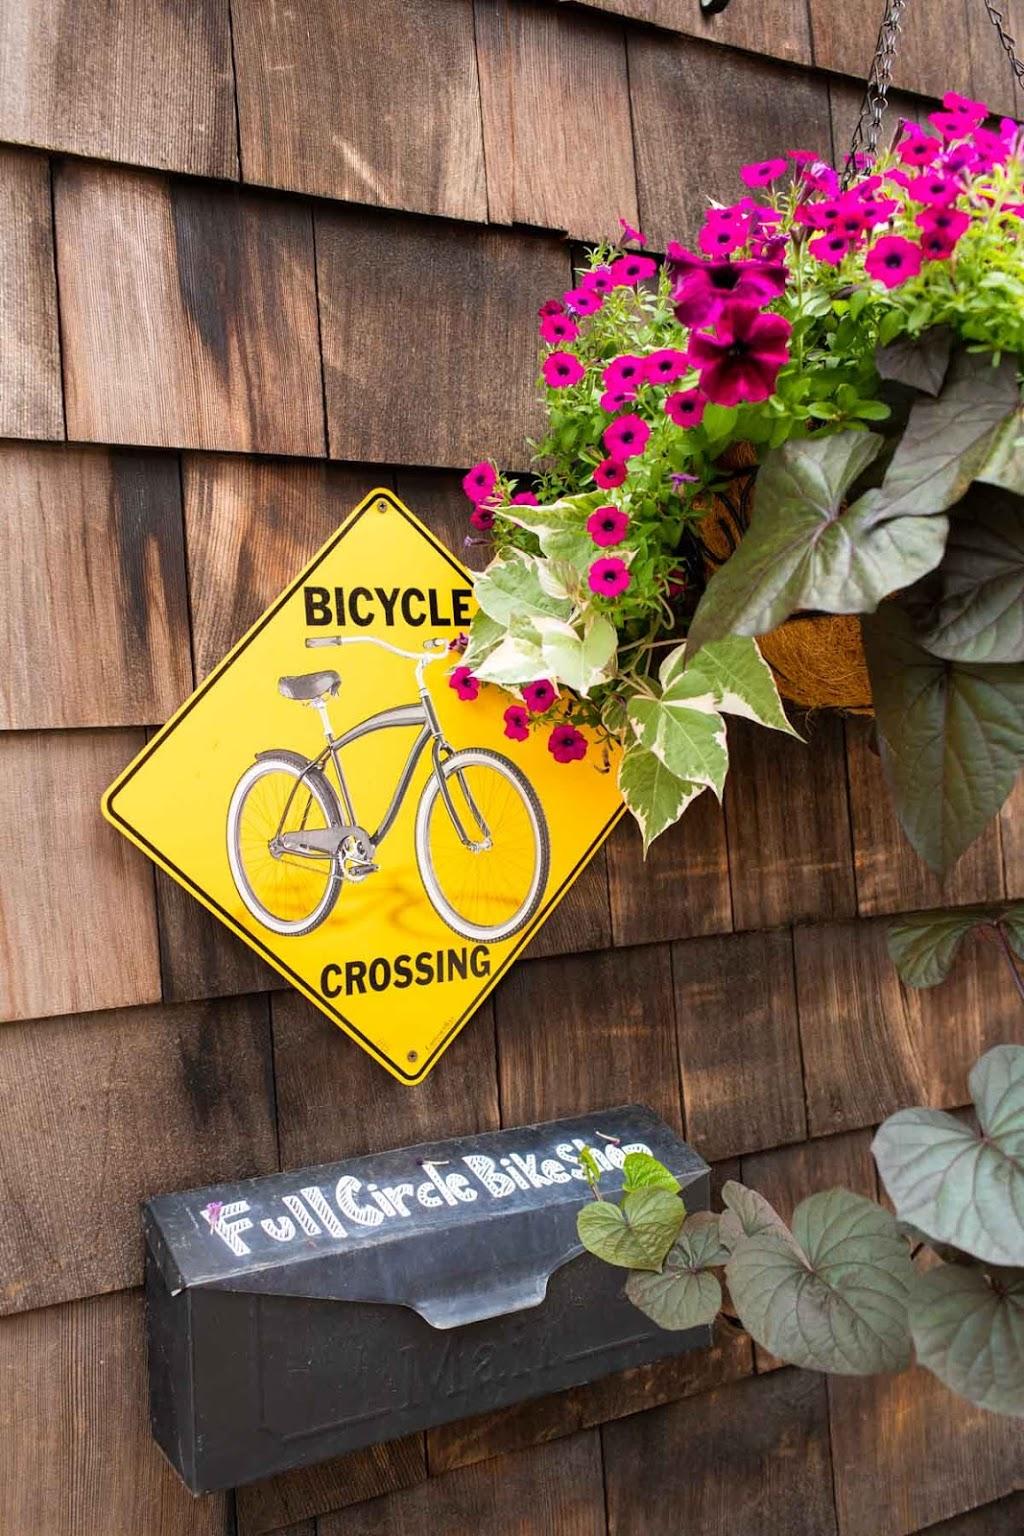 Full Circle Bike Shop - bicycle store  | Photo 6 of 9 | Address: 30 N Maple St, Florence, MA 01062, USA | Phone: (413) 585-8700